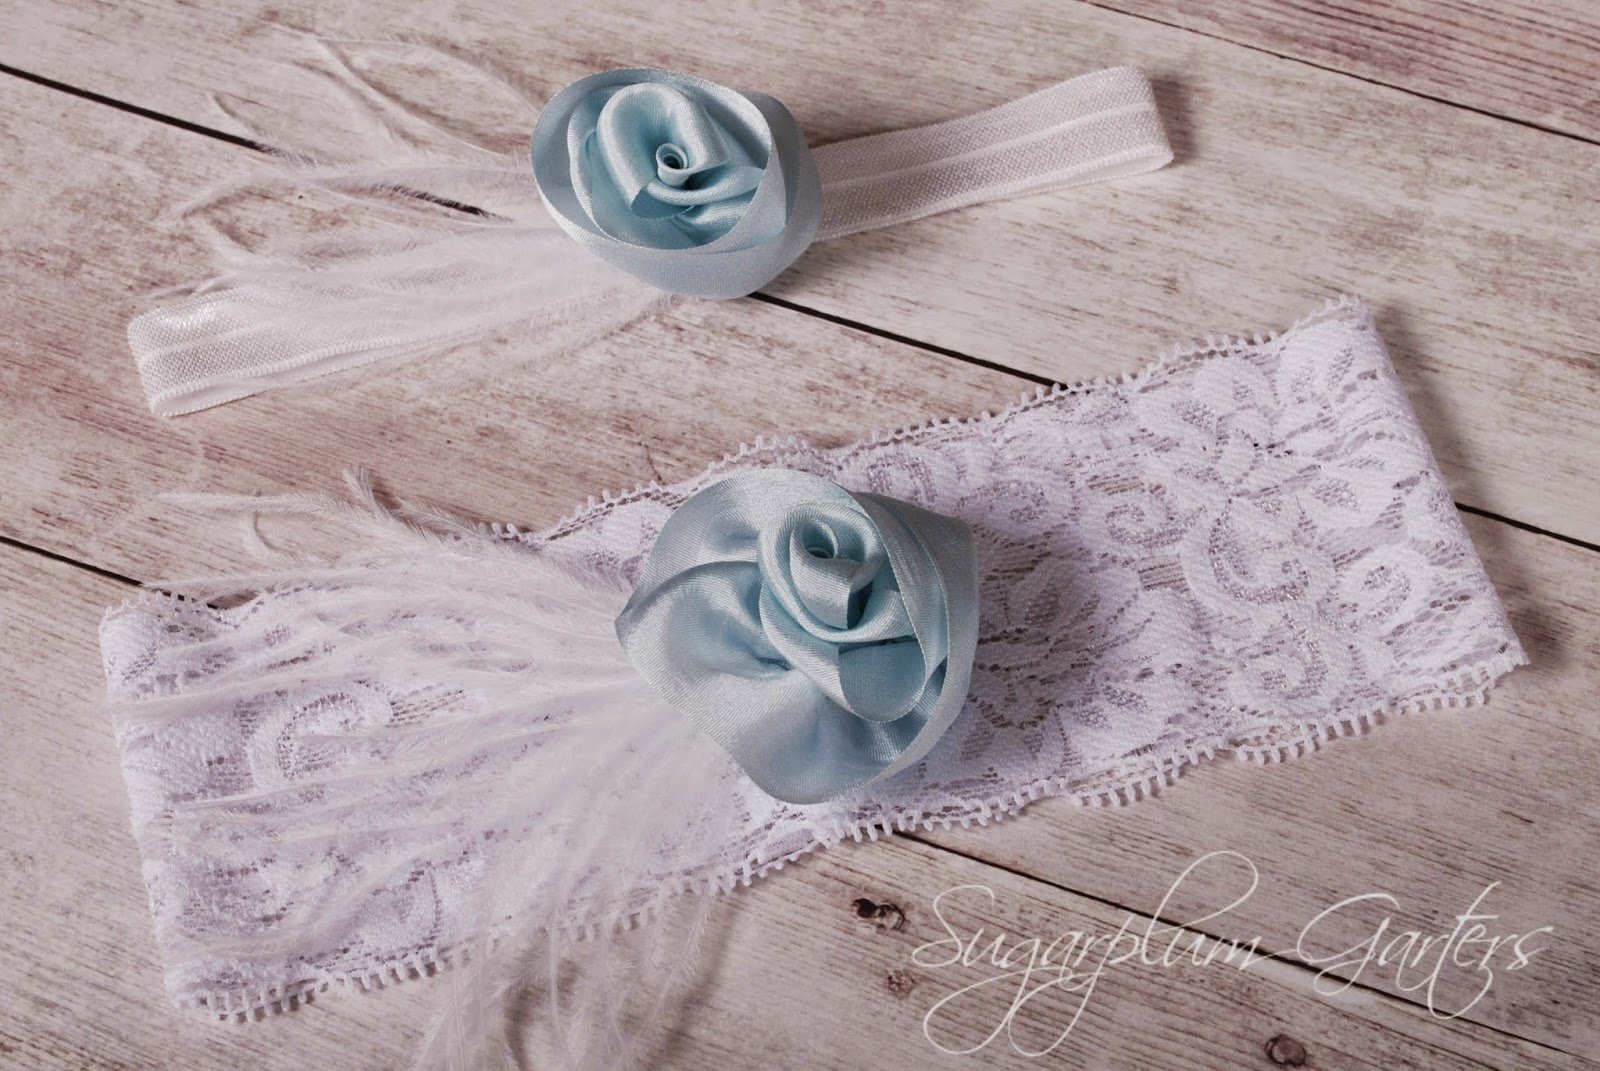 Wedding Garter Set in Pale Blue Silk and White Lace by Sugarplum Garters